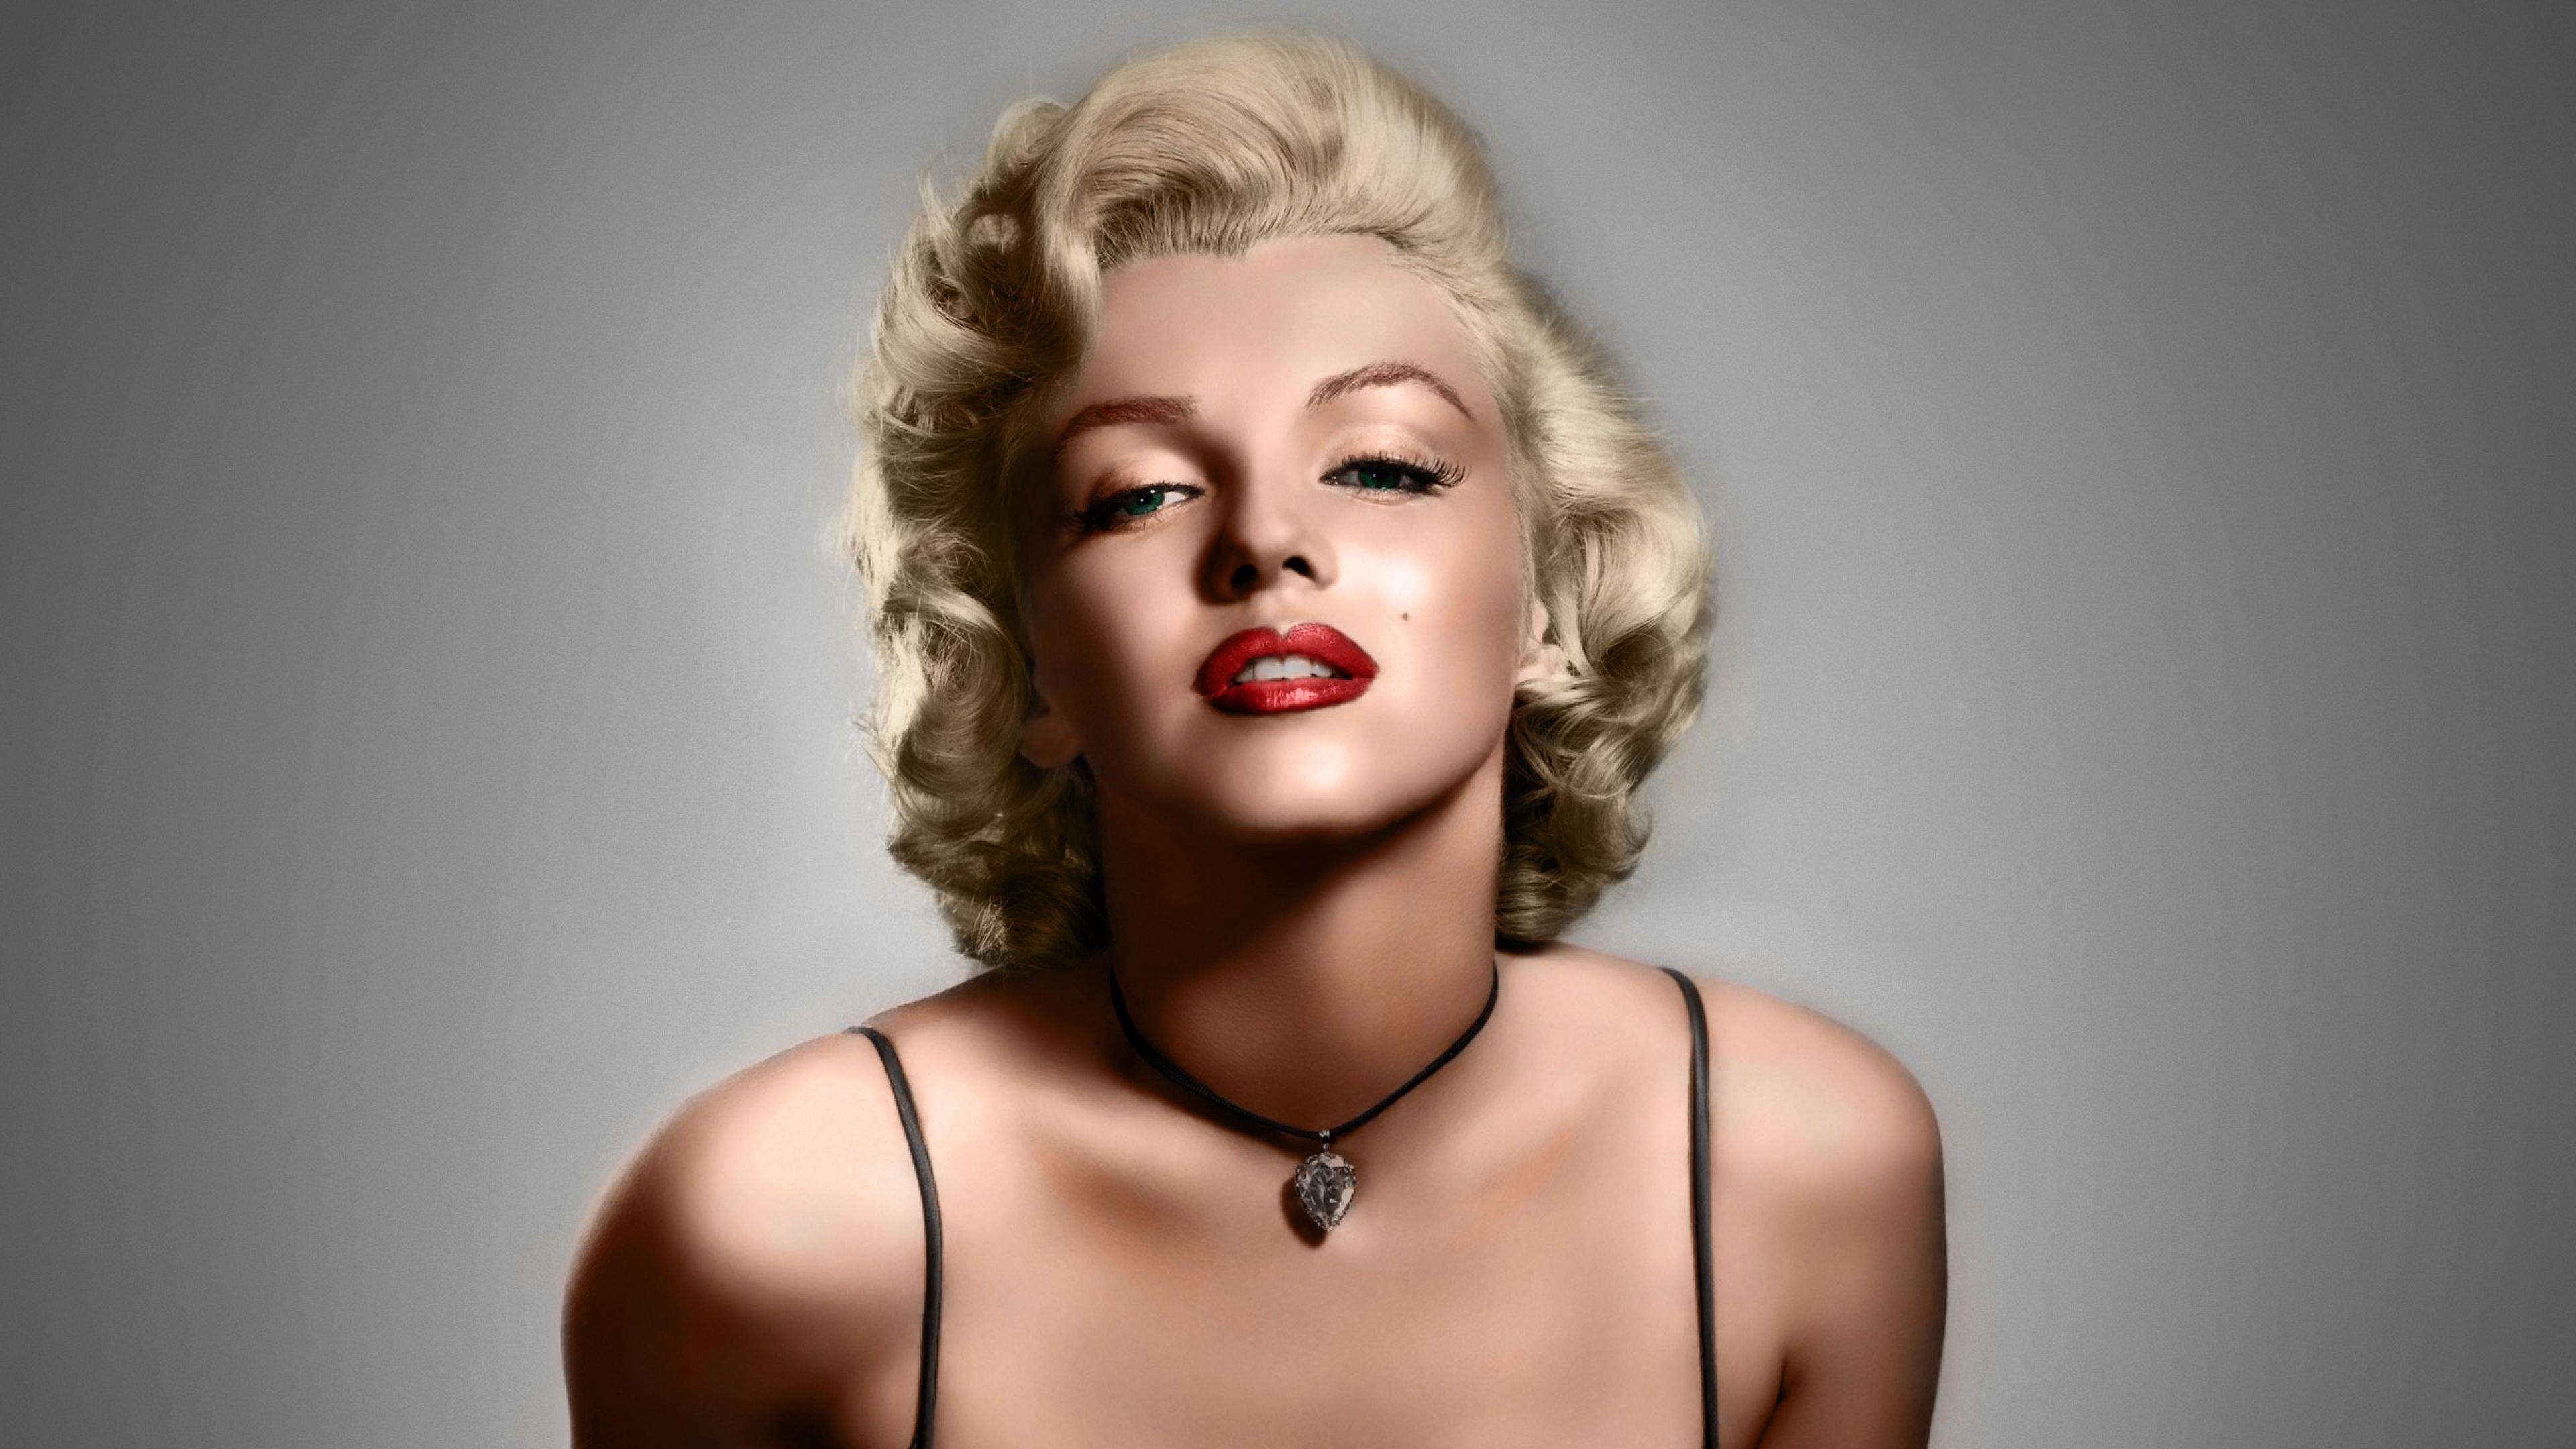 Marilyn Monroe Blonde Actress